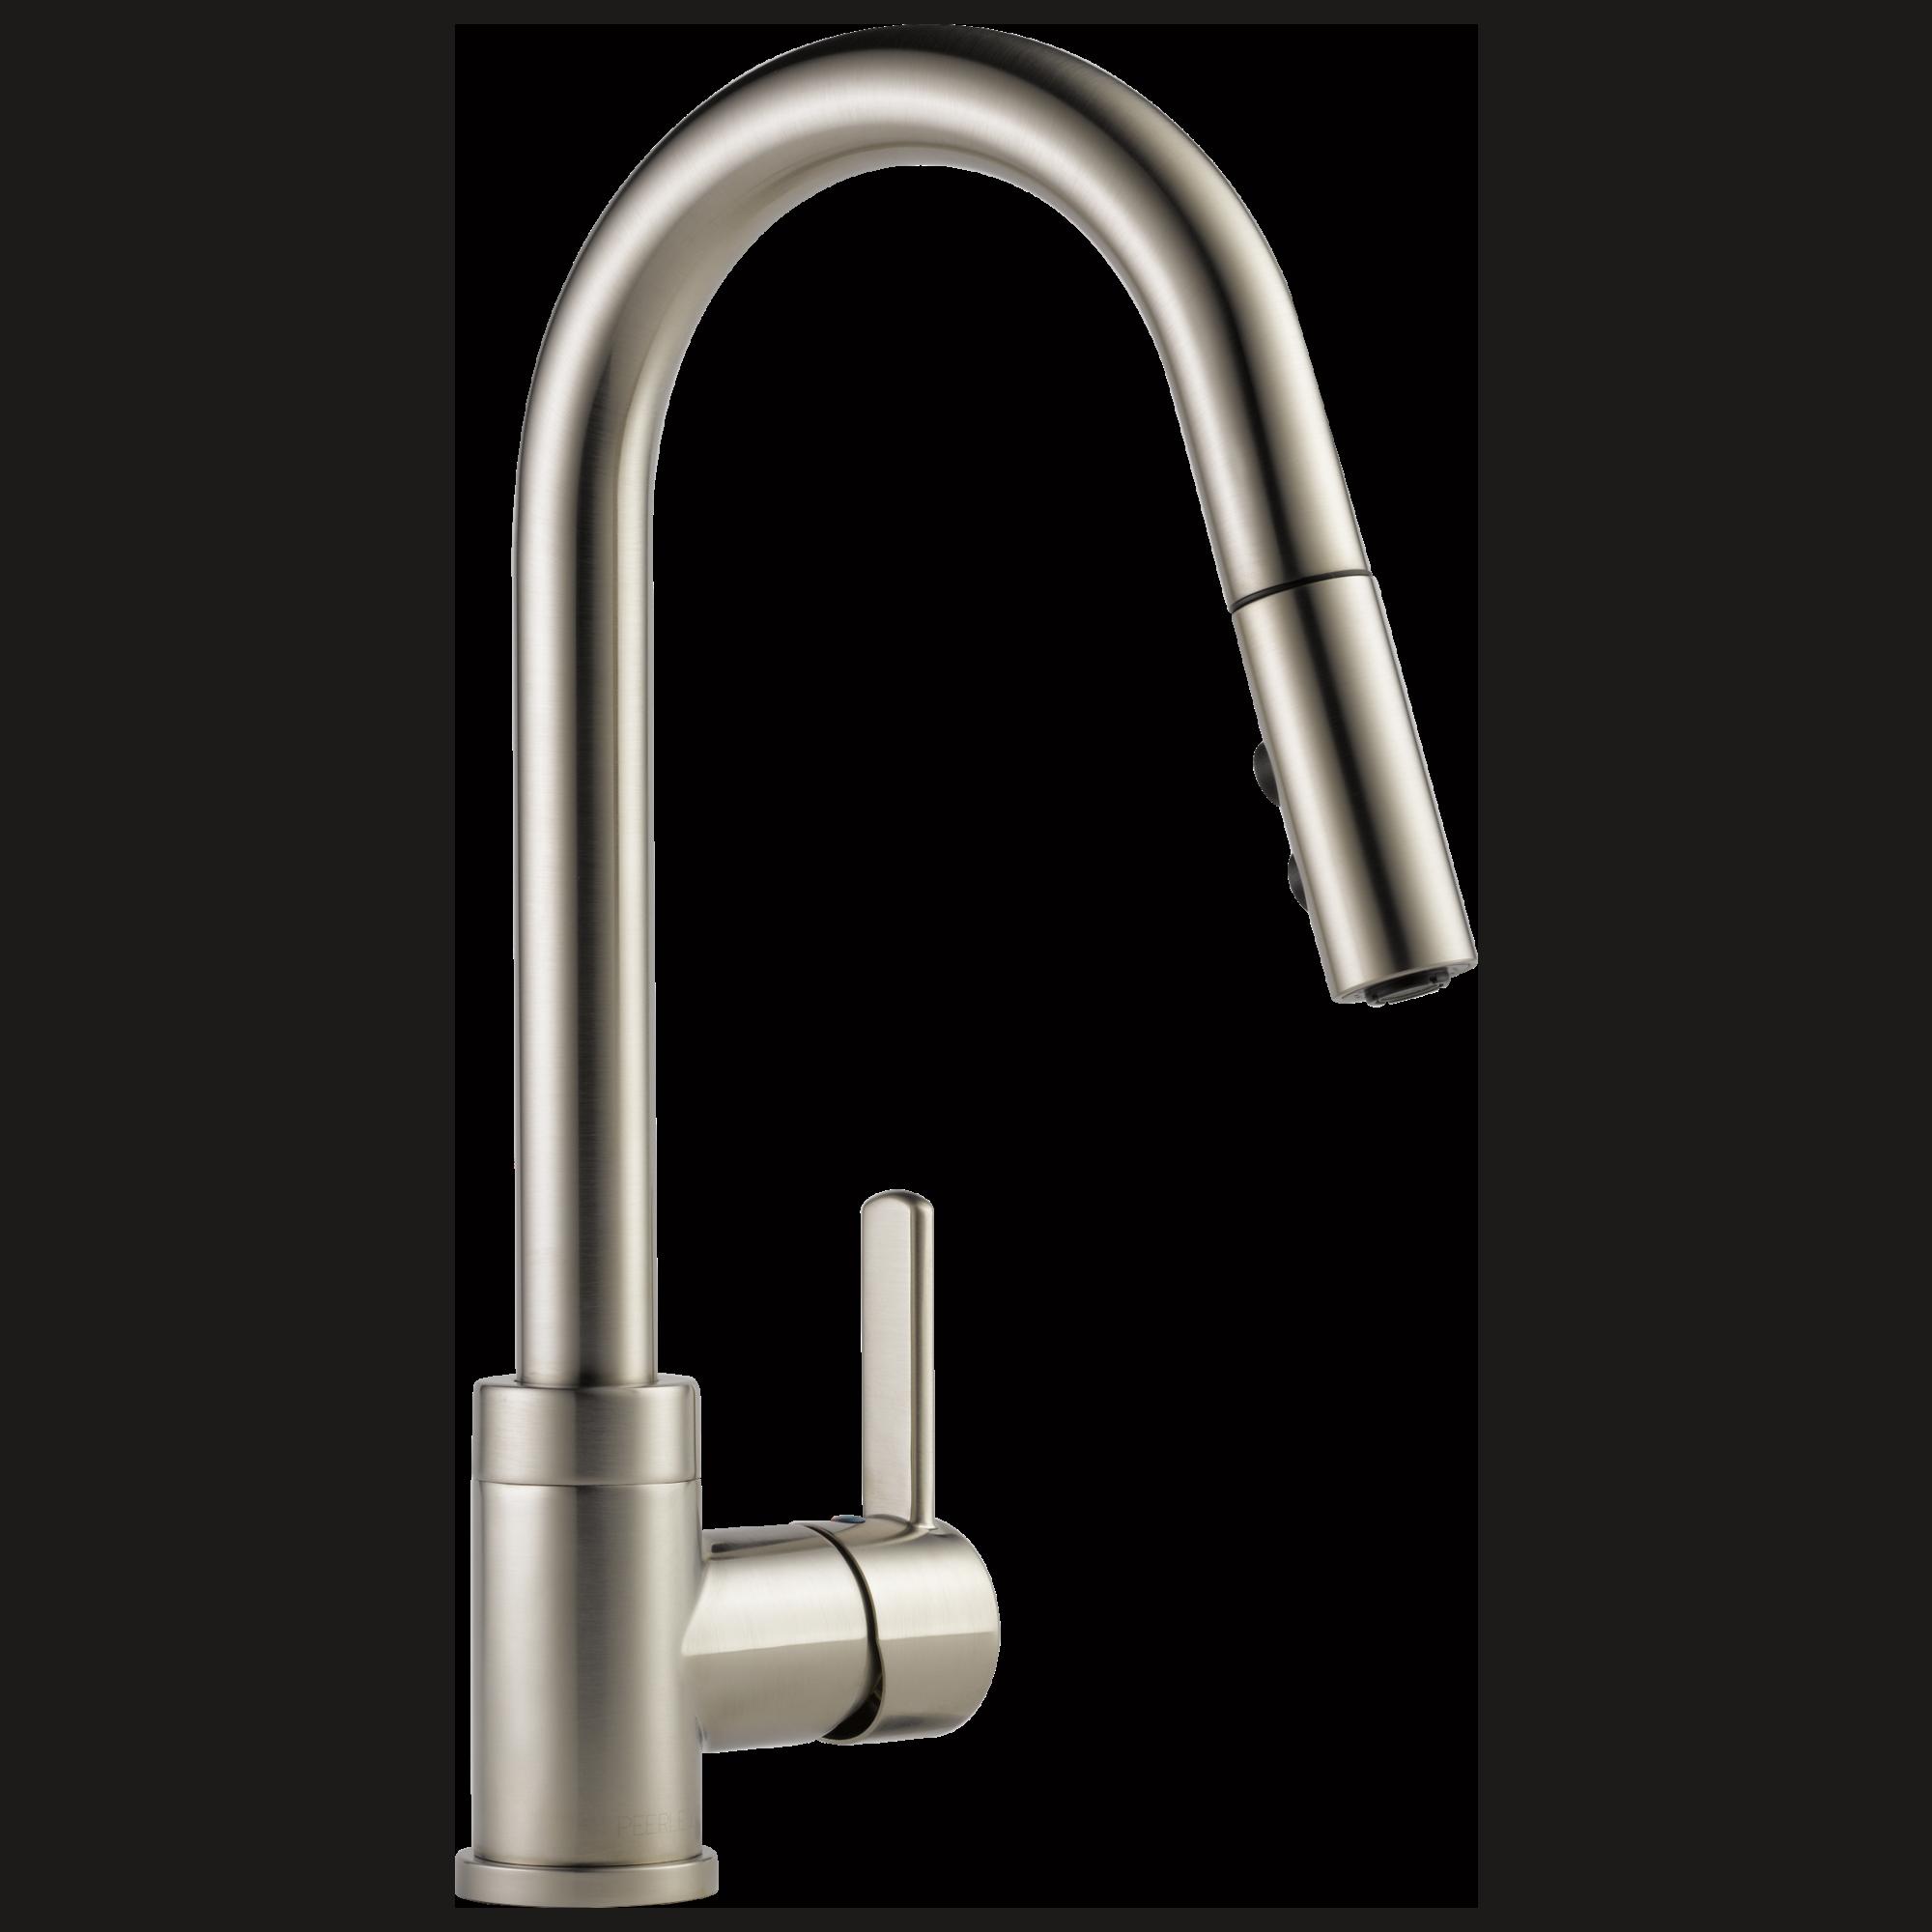 28 Alluring Peerless Linden Kitchen Faucet Moen Kitchen Faucet Reviews Medium Size Of